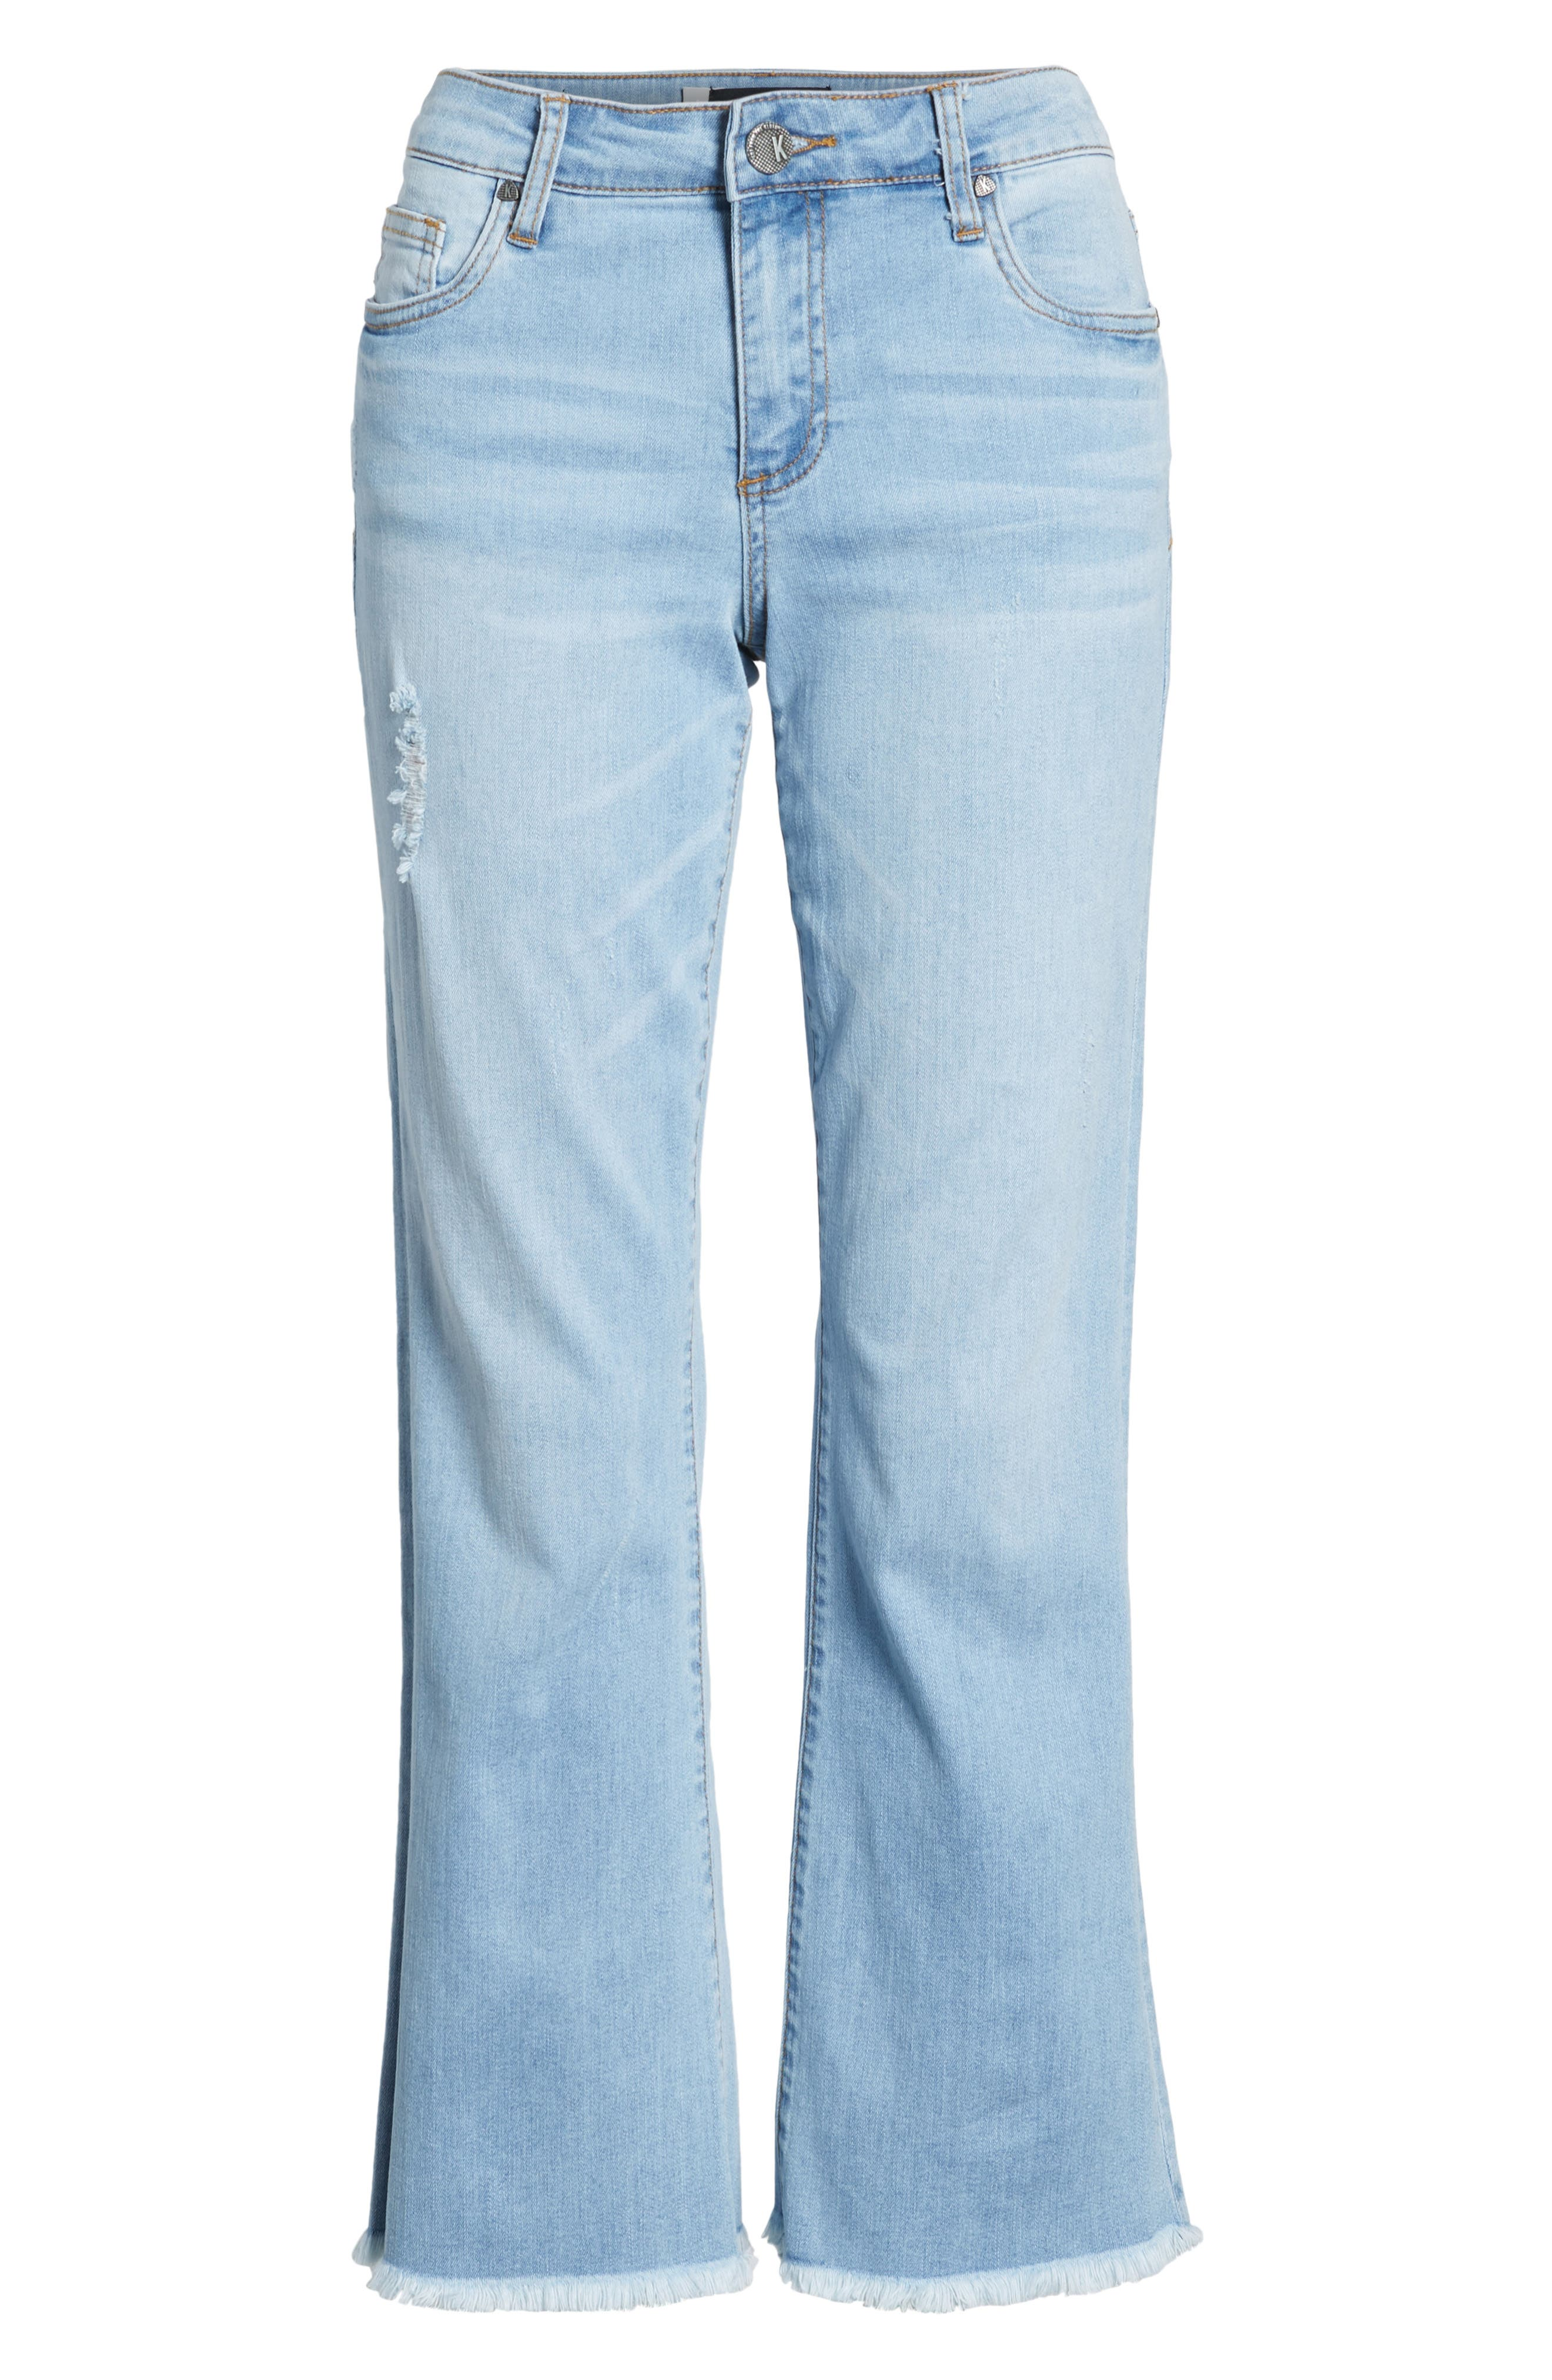 KUT Kollection Gidget Cutoff Denim Shorts,                             Alternate thumbnail 6, color,                             400